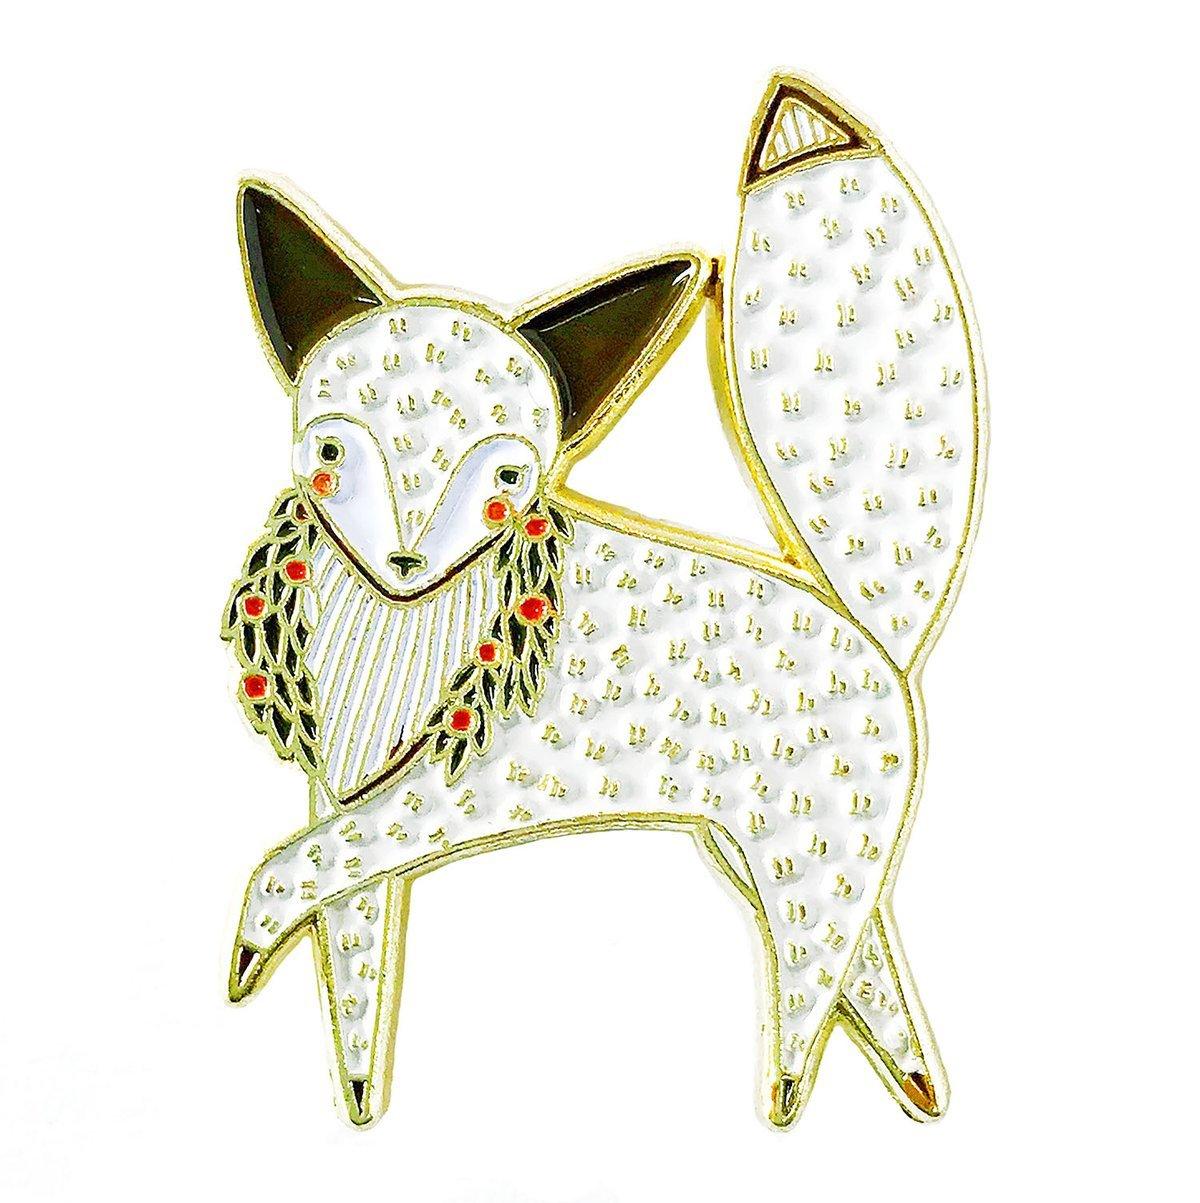 Gingiber - Enamel Pin - Merriment Arctic Fox